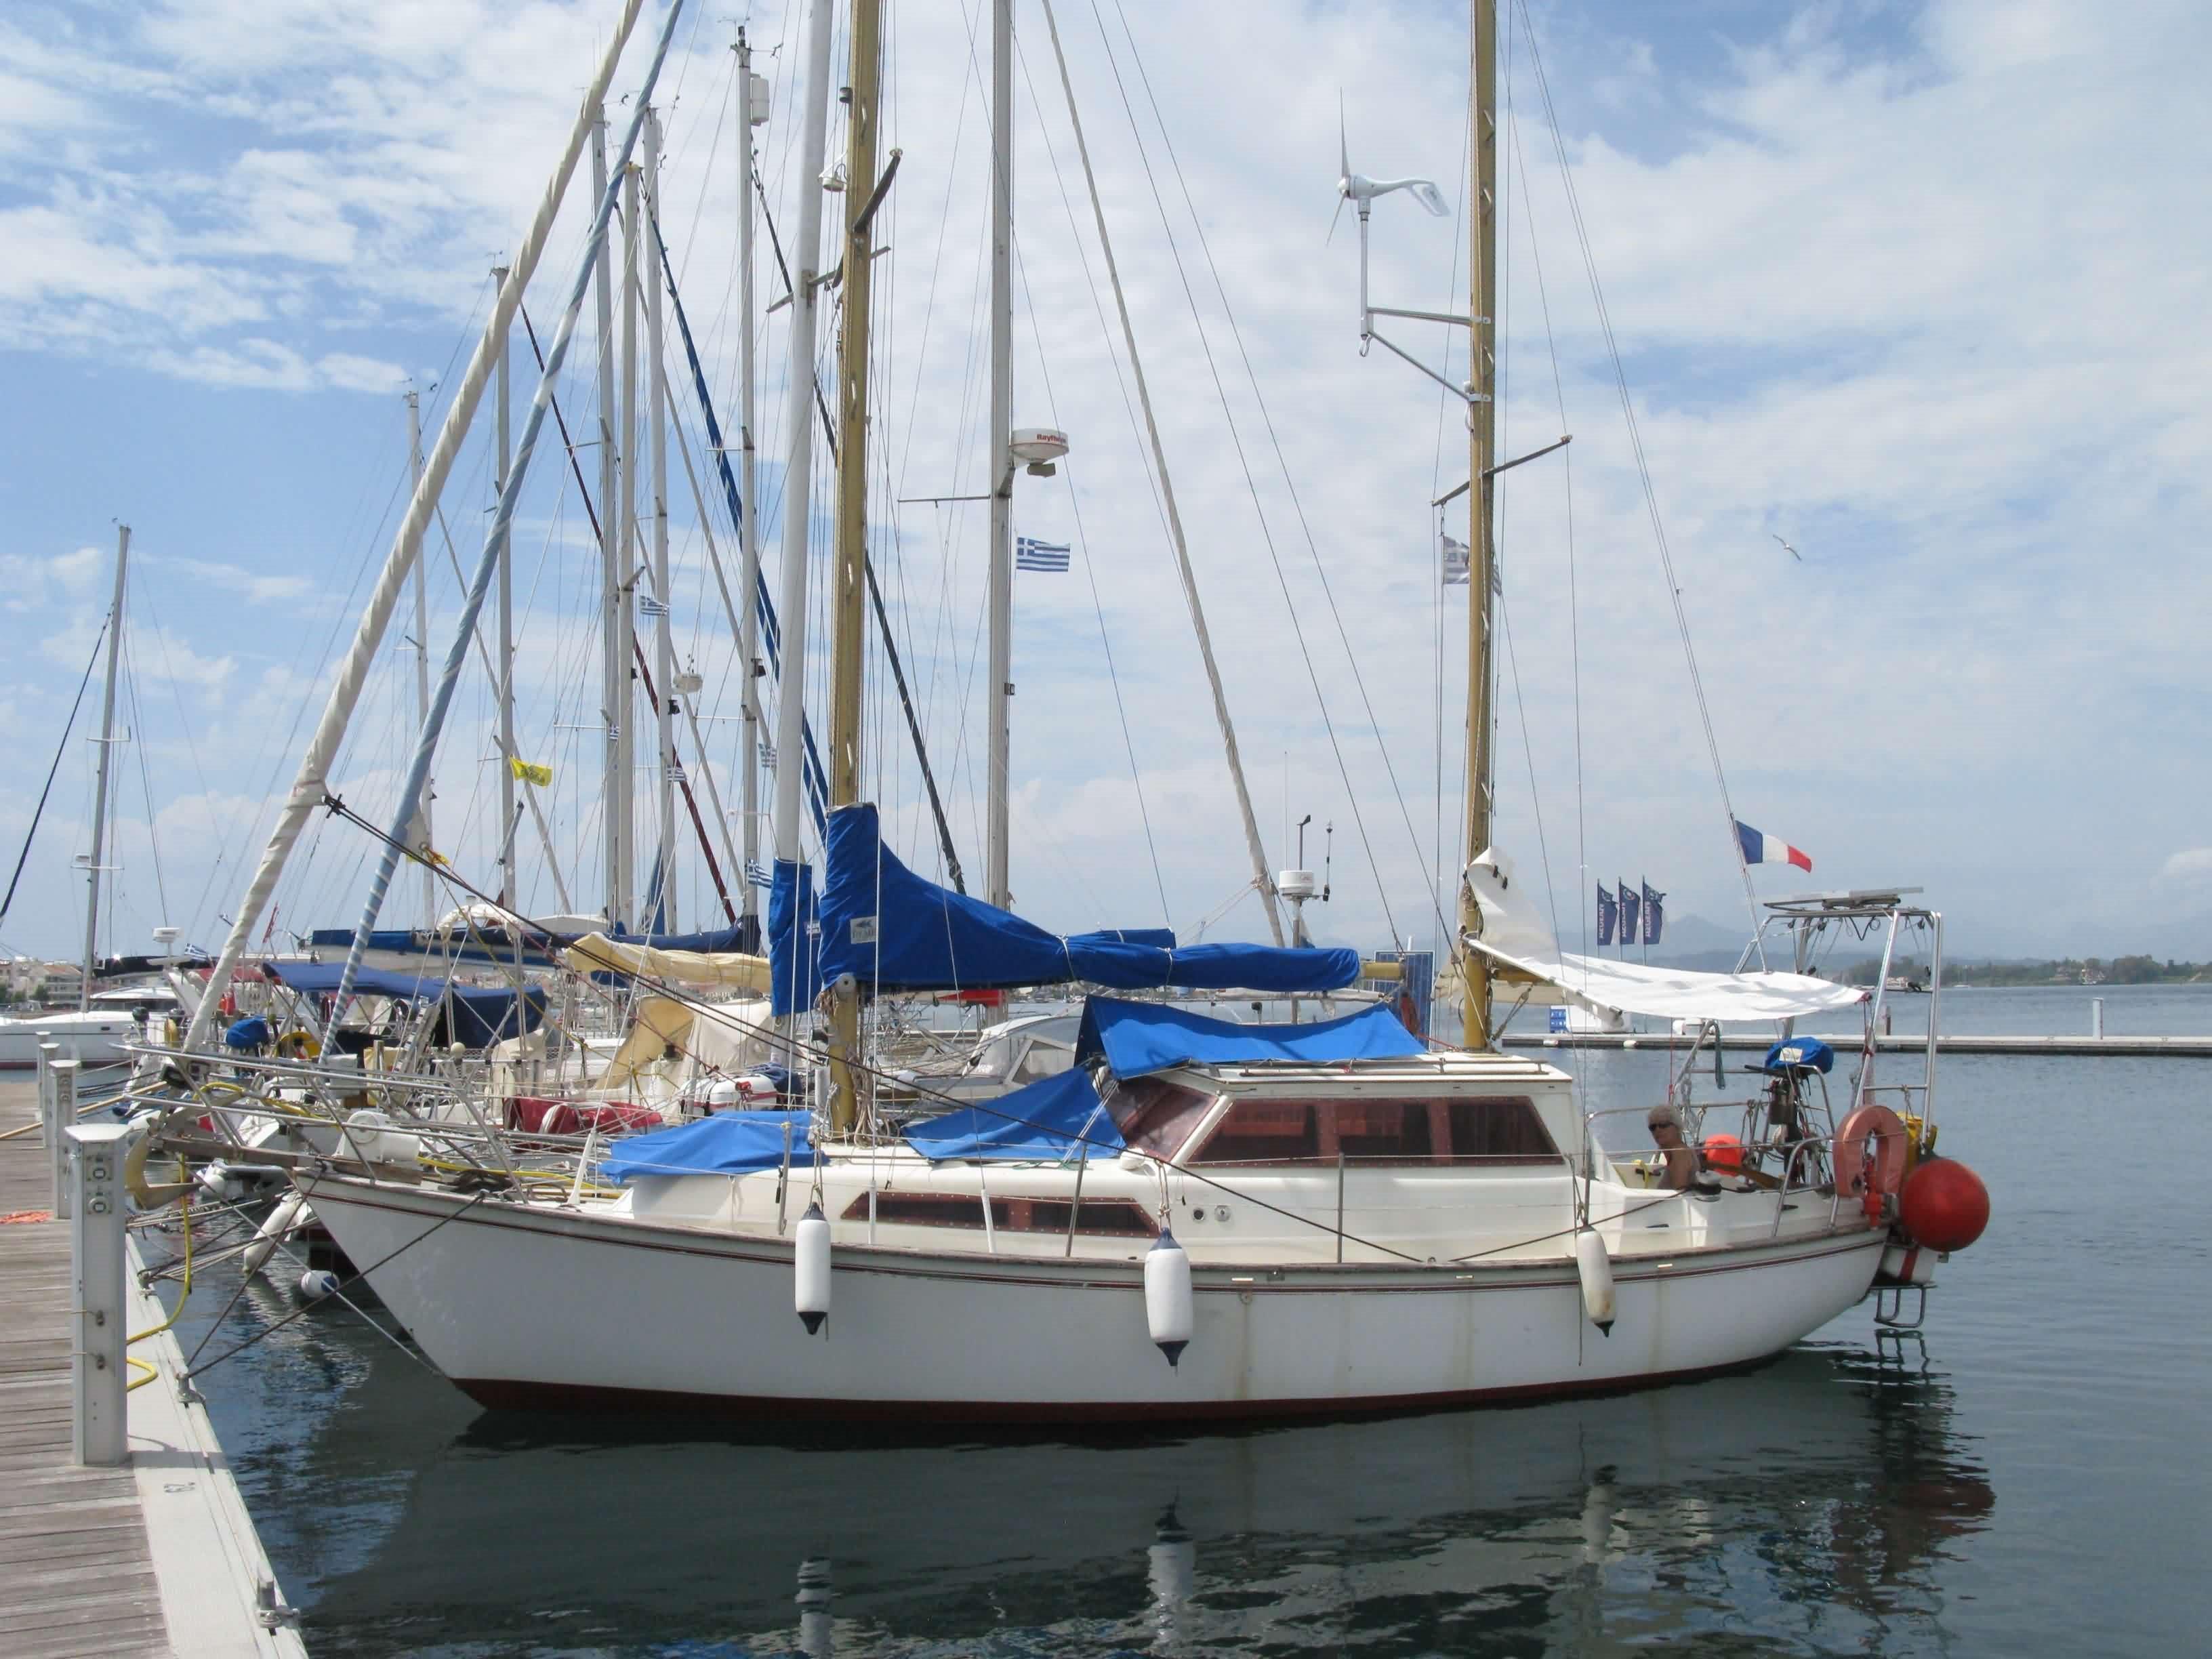 Beneteau Evasion 32 Boat For Sale